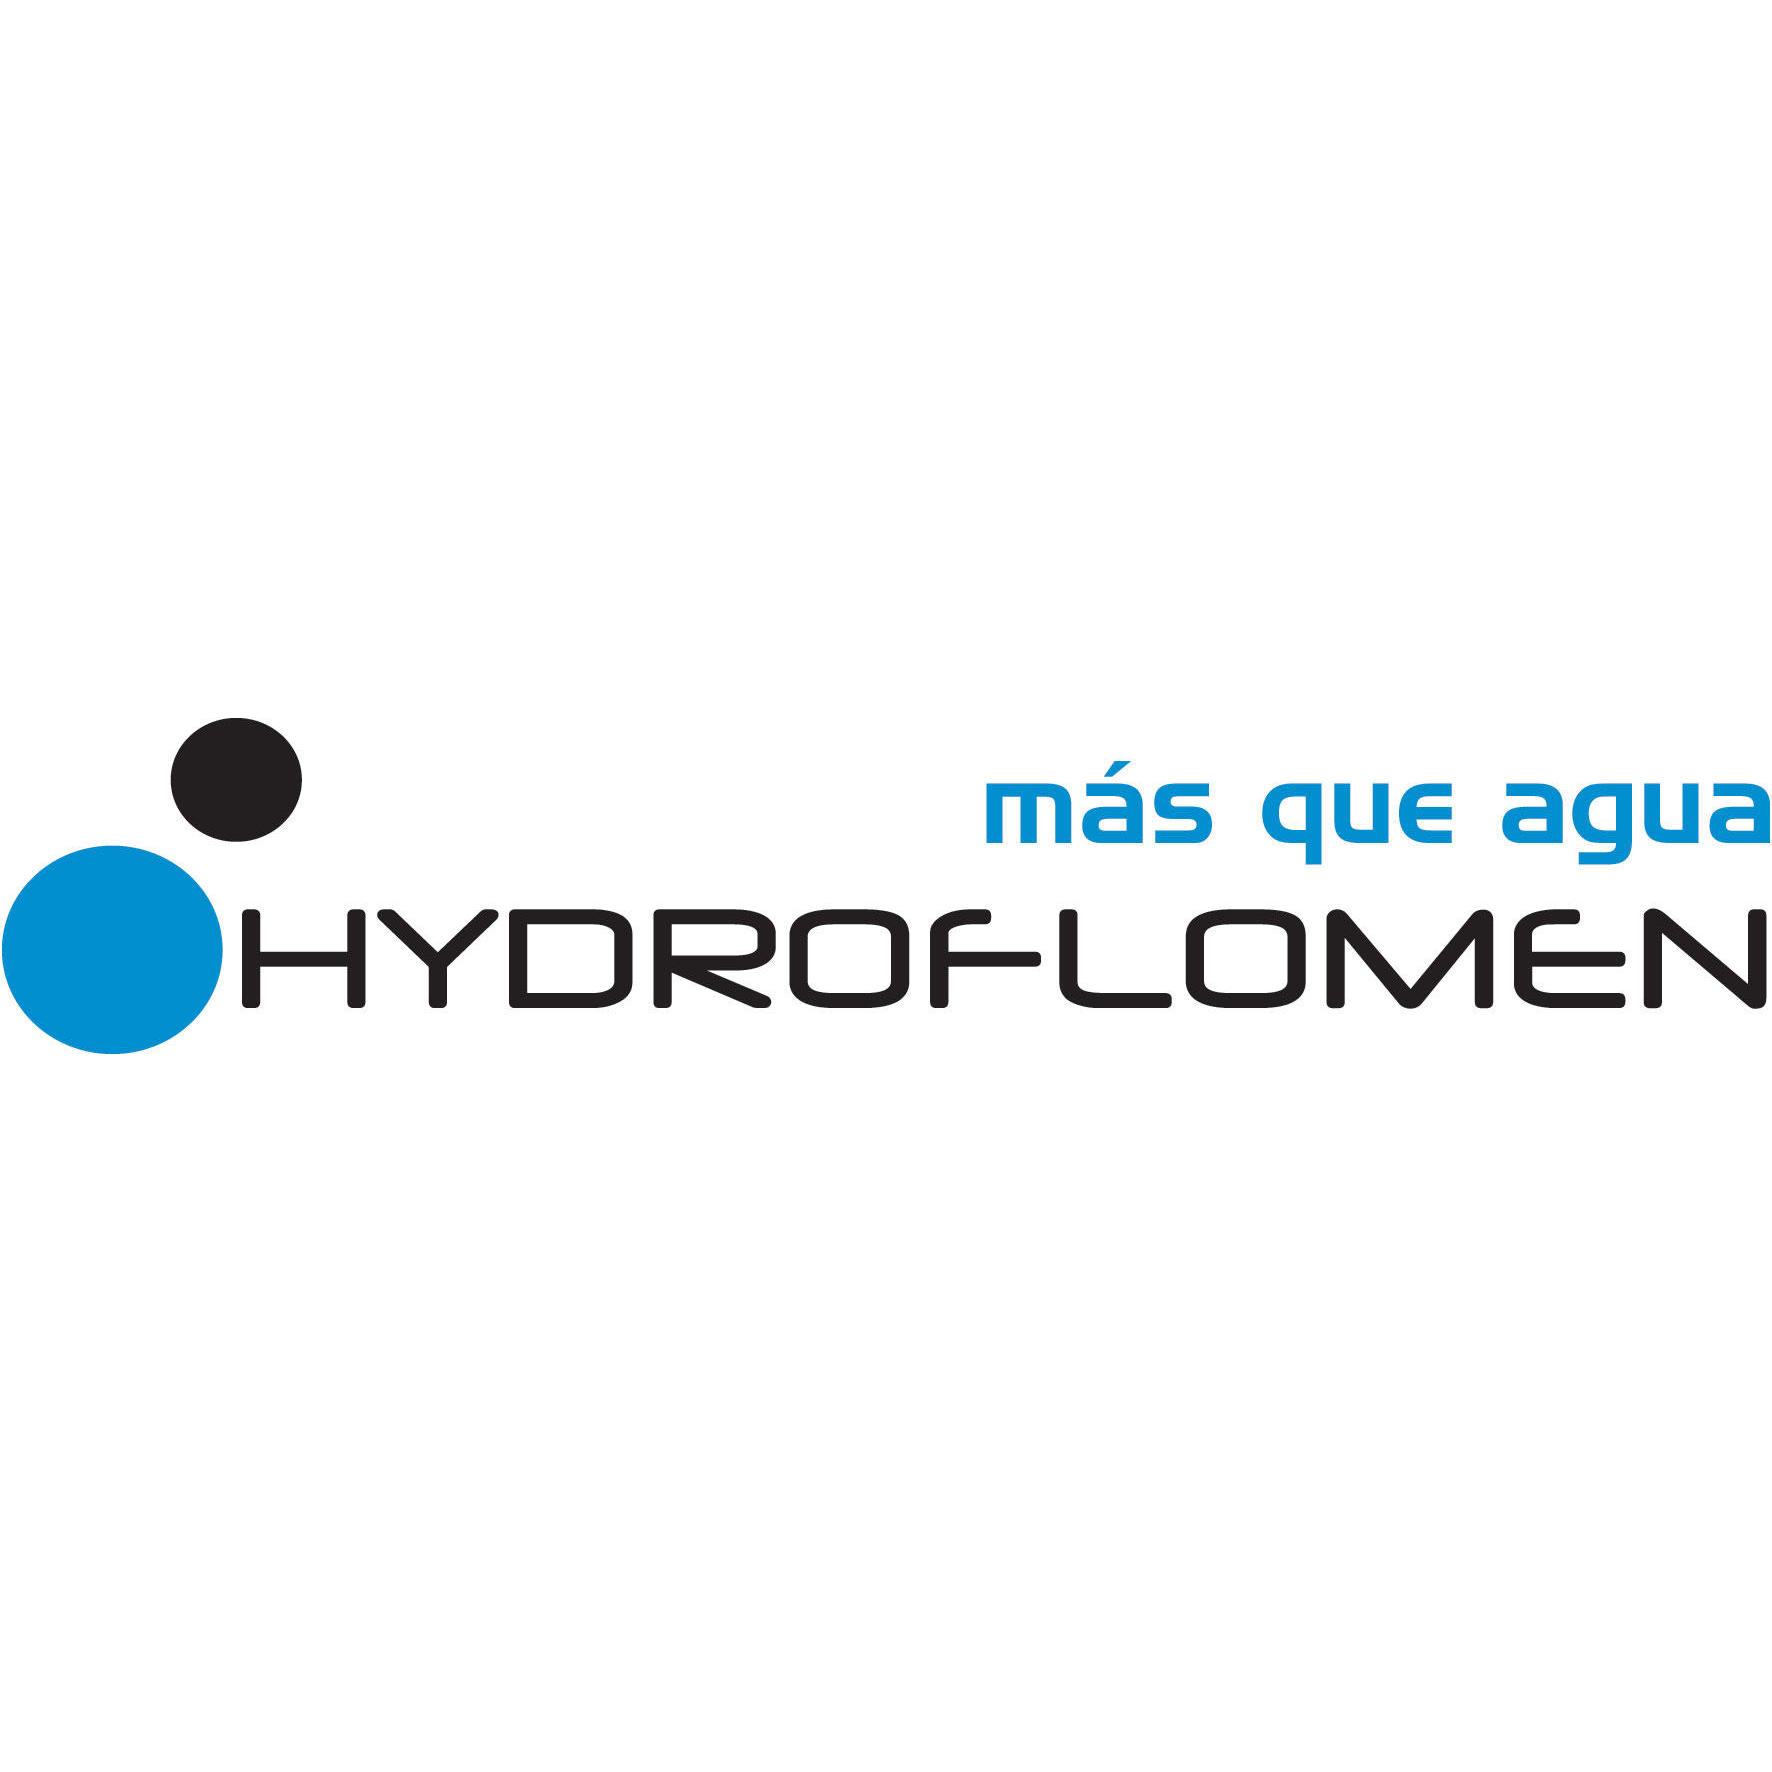 Hydroflomen